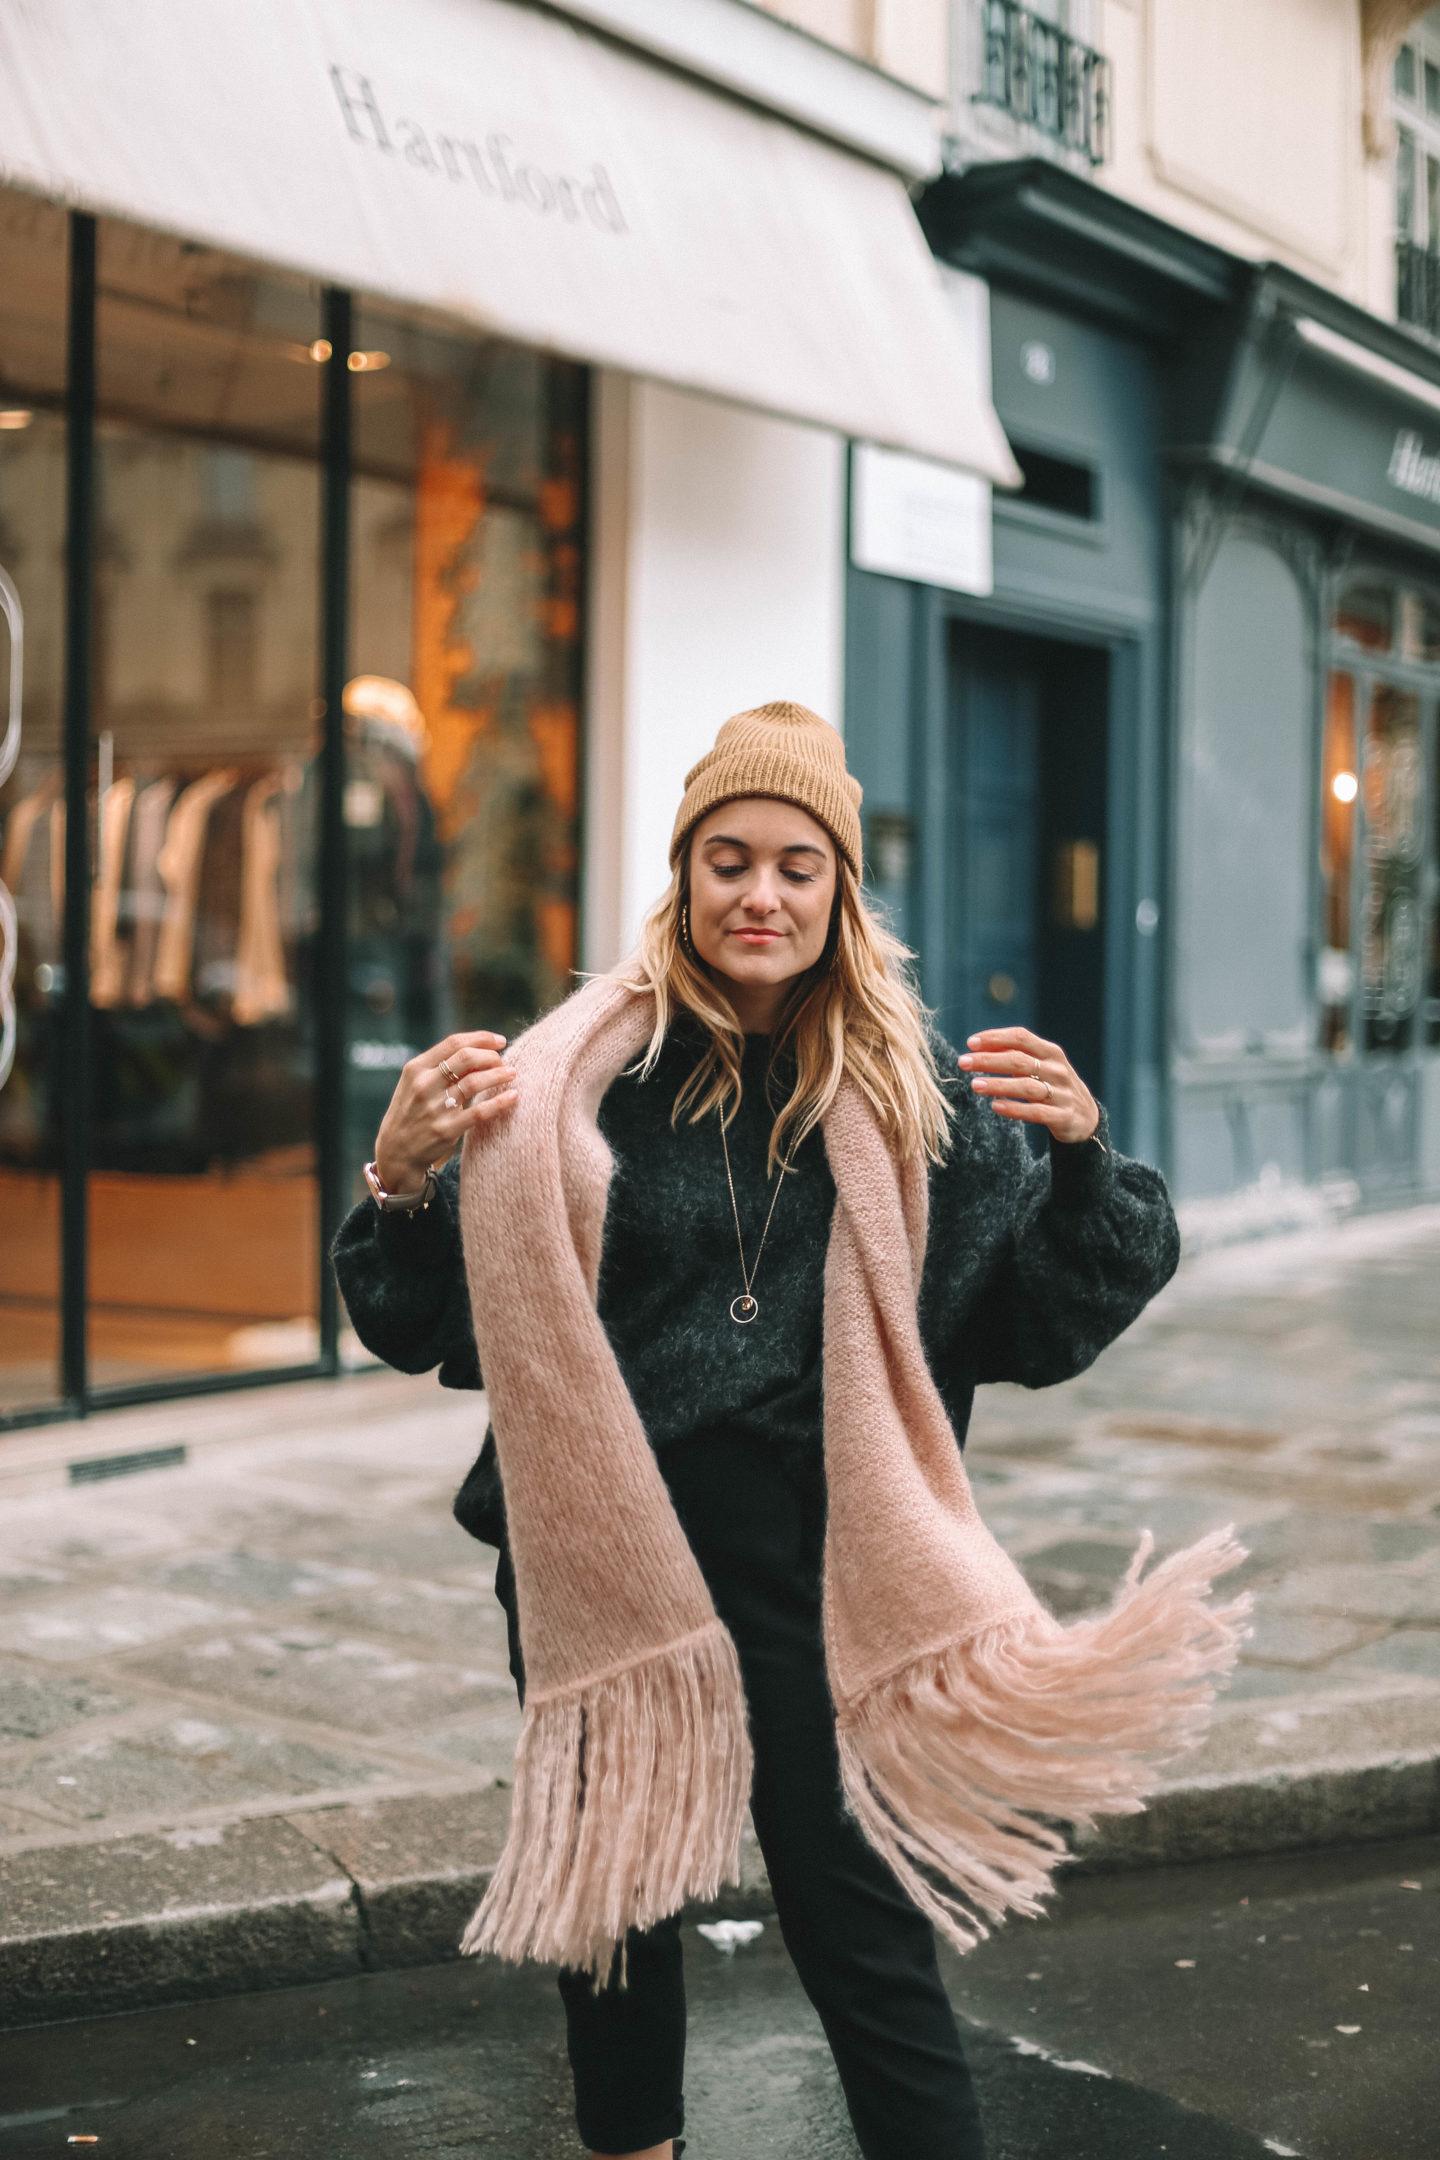 Echarpe Rose American Vintage - Blondie baby blog mode et voyages